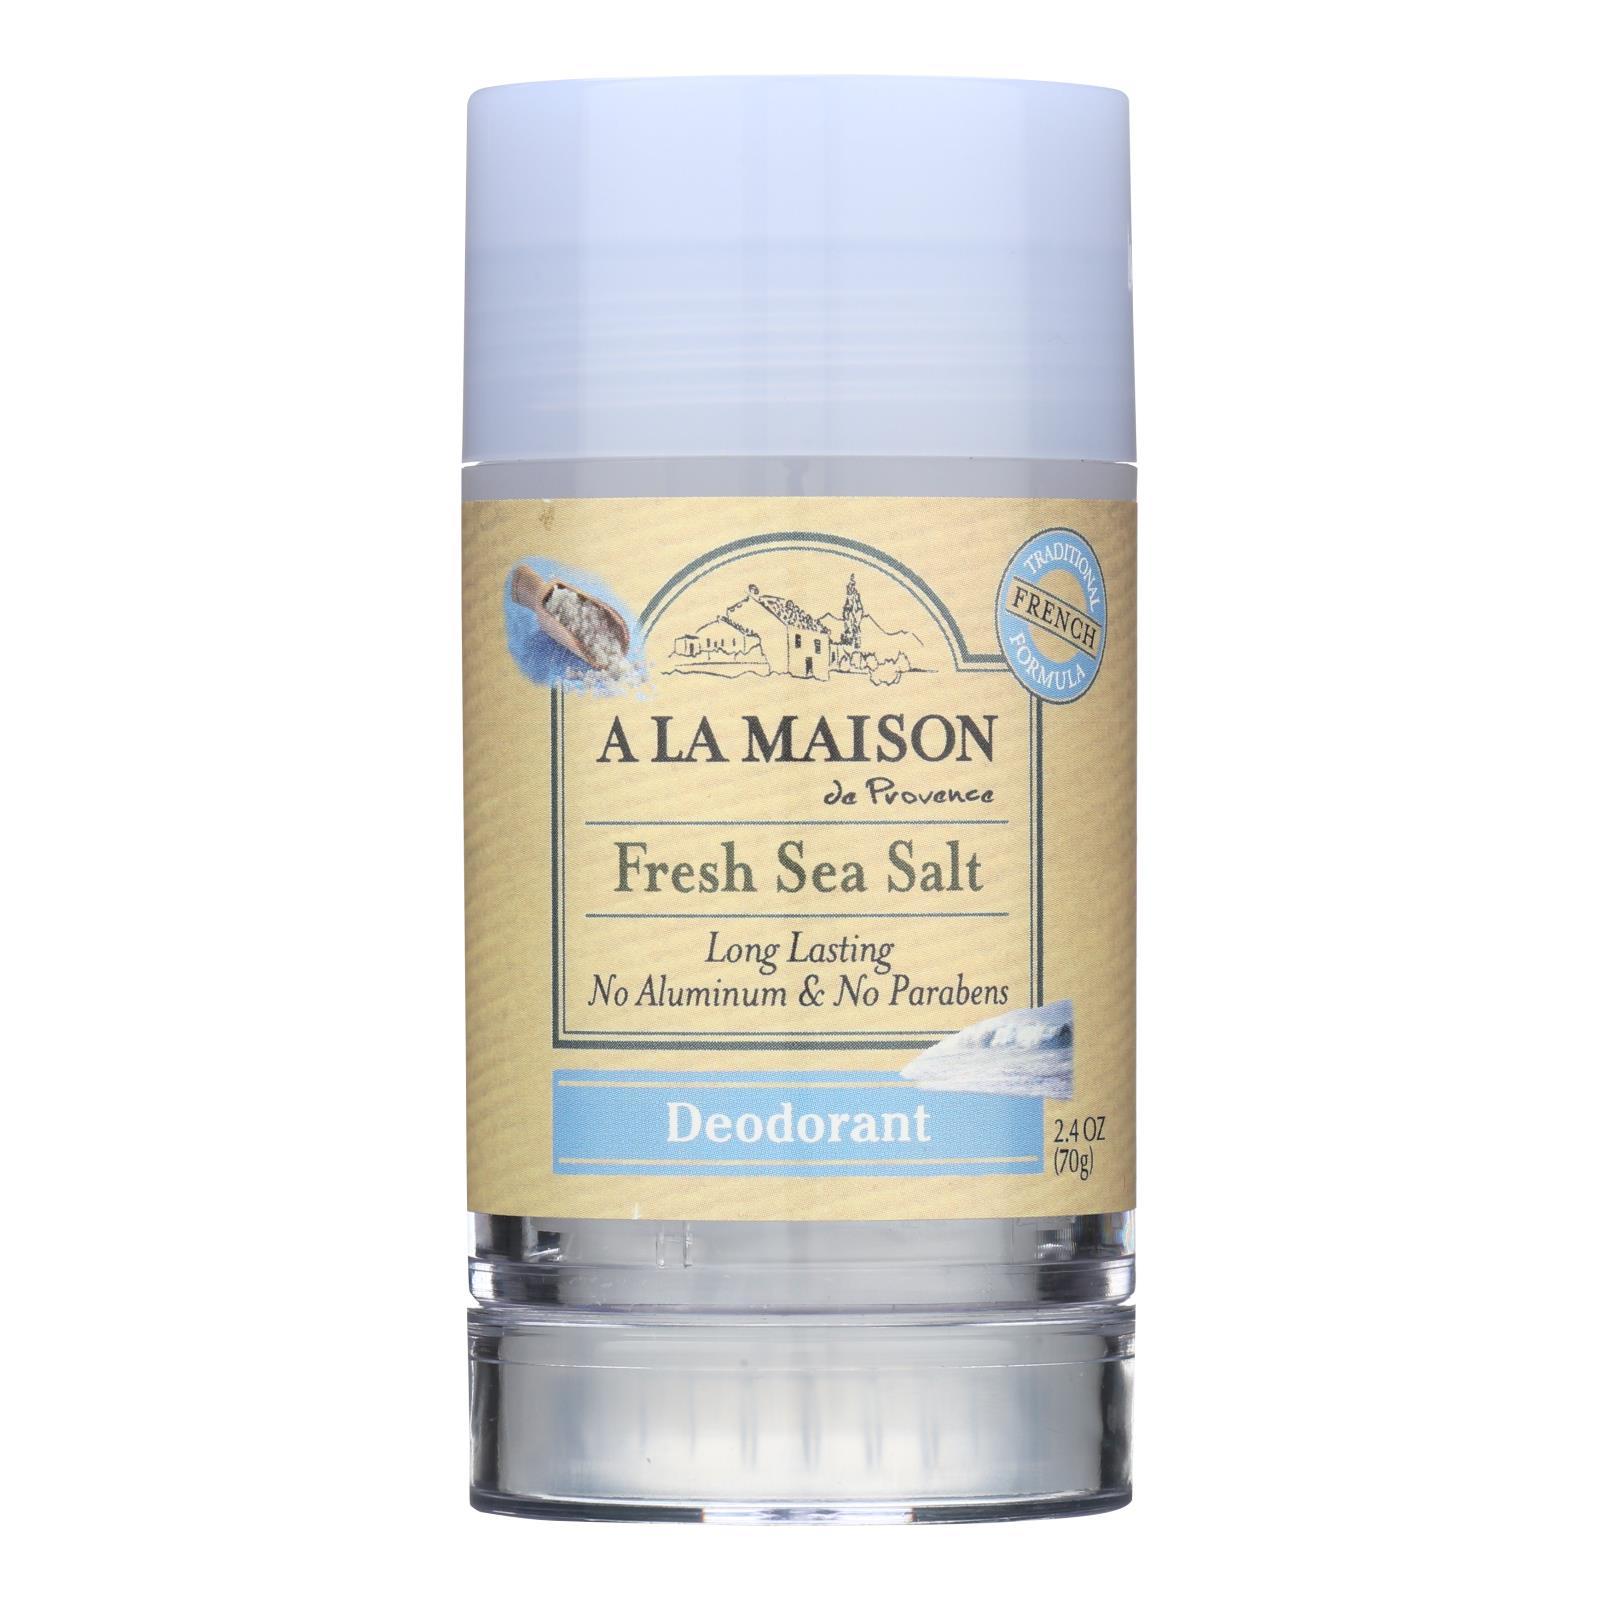 A La Maison - Deodorant - Fresh Sea Salt - 2.4 Oz